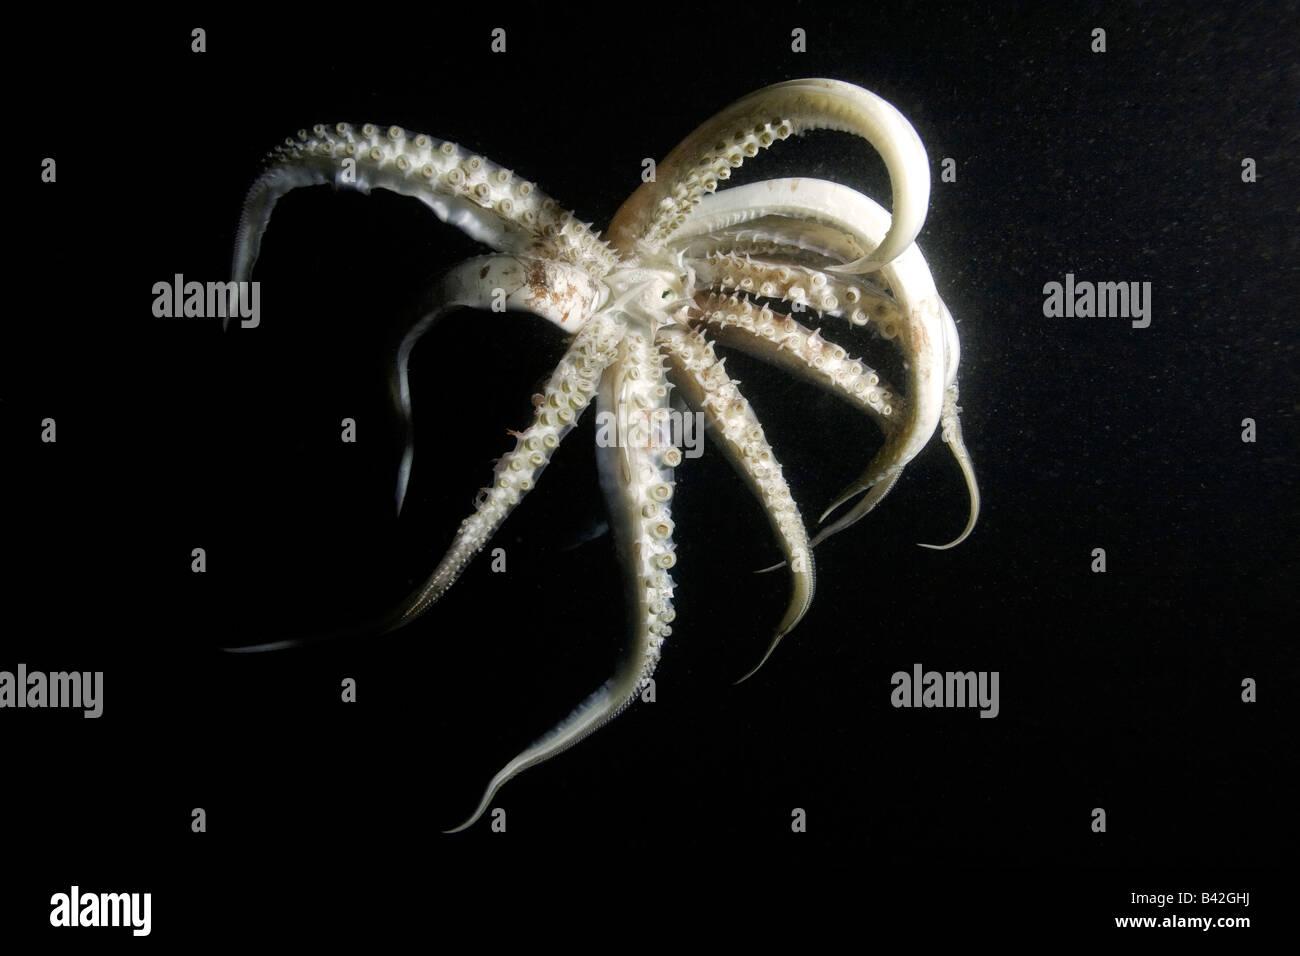 Jumbo calamari calamaro di Humboldt di notte Dosidicus Gigas Loreto Mare di Cortez Baja California Oriente Pacifico Immagini Stock